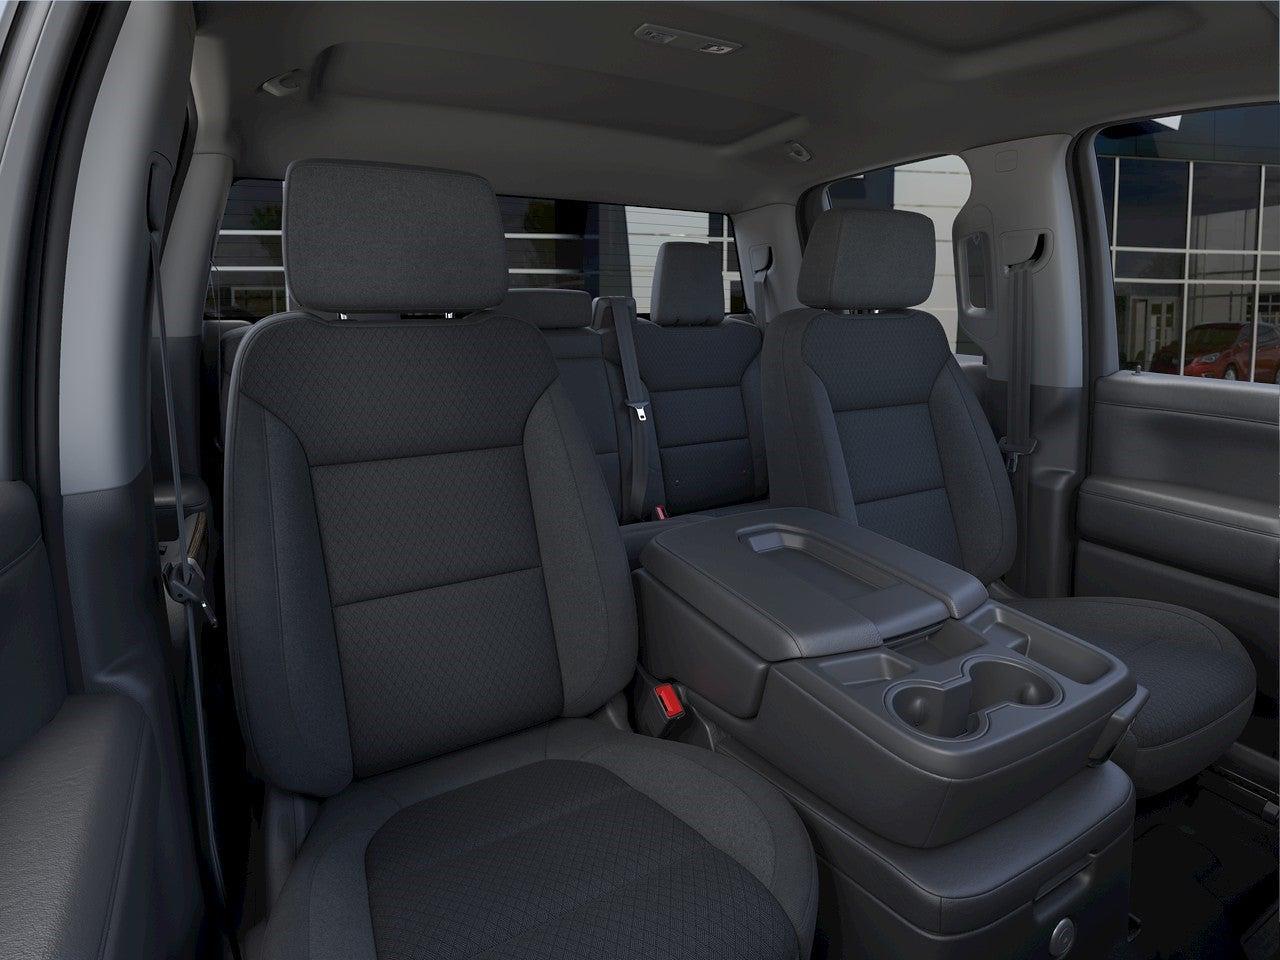 2021 GMC Sierra 1500 Double Cab 4x4, Pickup #V21148 - photo 13